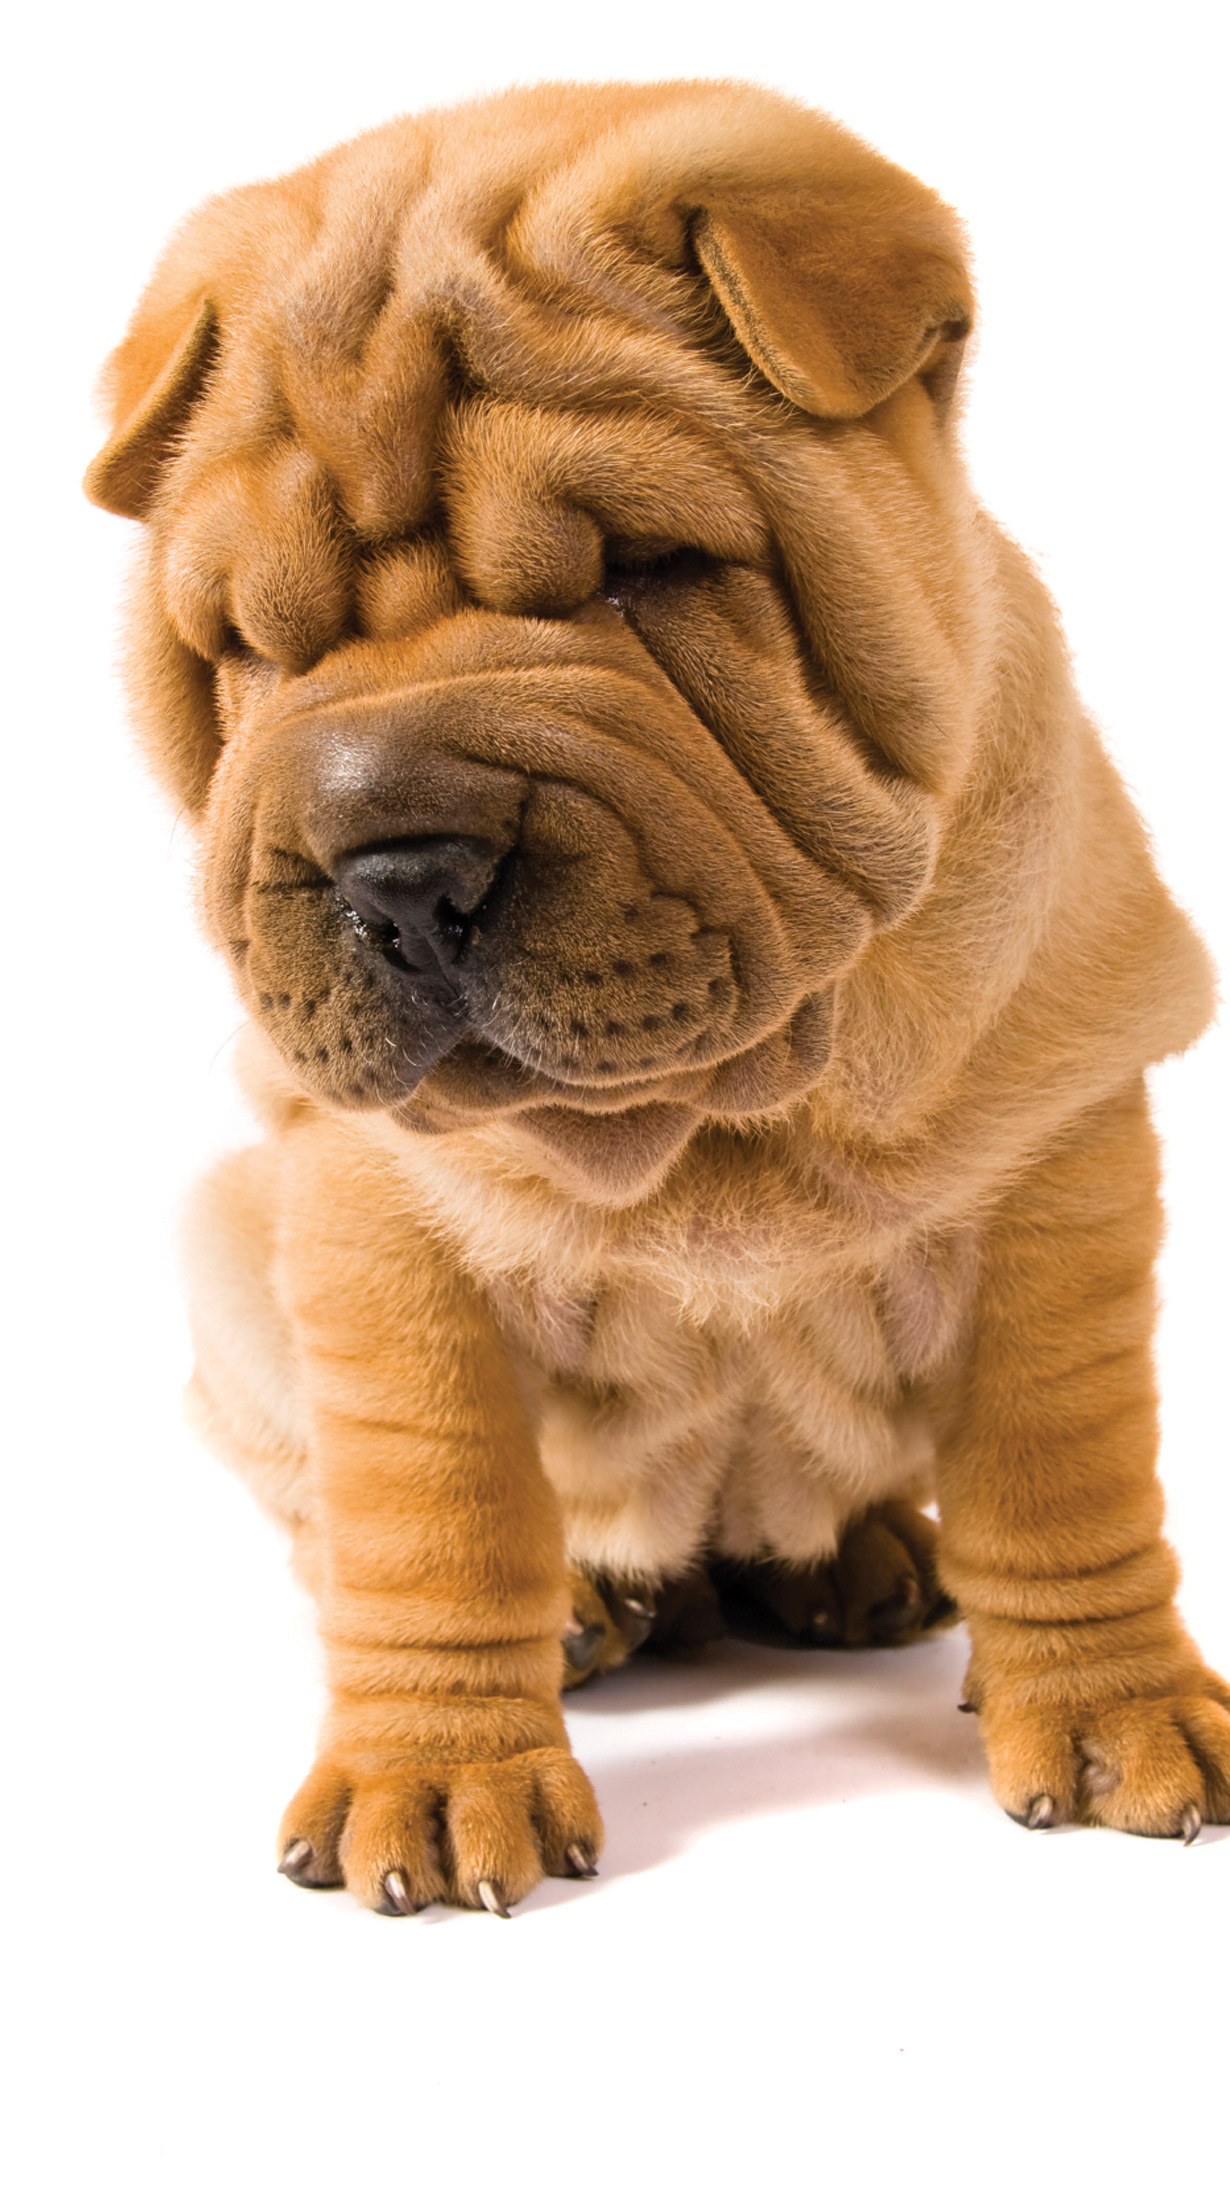 EyeOne Specialty Procedure for Wrinkles